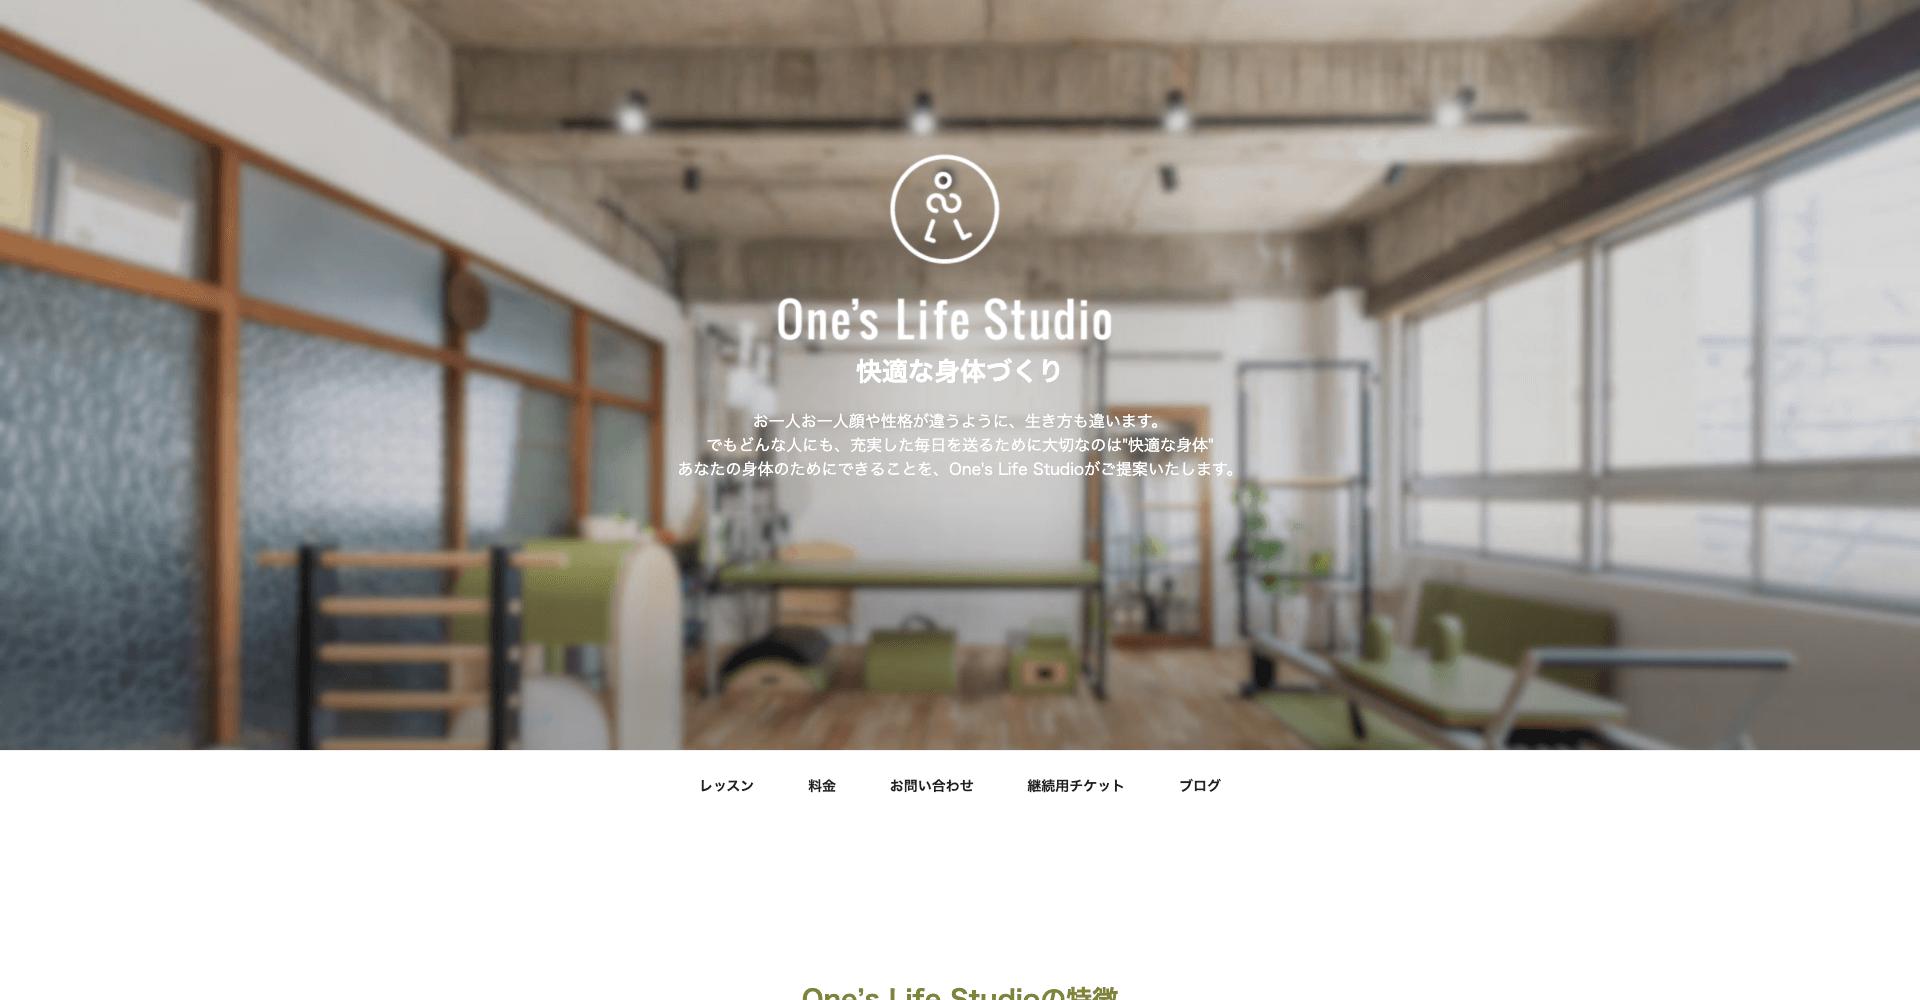 One's Life Studio(ワンズ ライフ スタジオ)